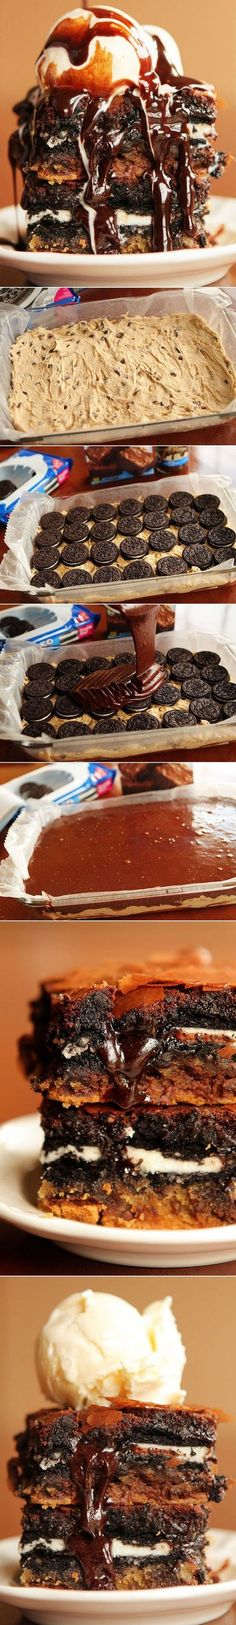 all-food-drink: Chocolate Chip Cookie n' Oreo Fudge Brownie Bar (chocolate fudge brownies mouths) Oreo Fudge, Fudge Brownies, Brownie Bar, Marshmallow Brownies, Hot Fudge, Yummy Treats, Sweet Treats, Yummy Food, Dessert Bars